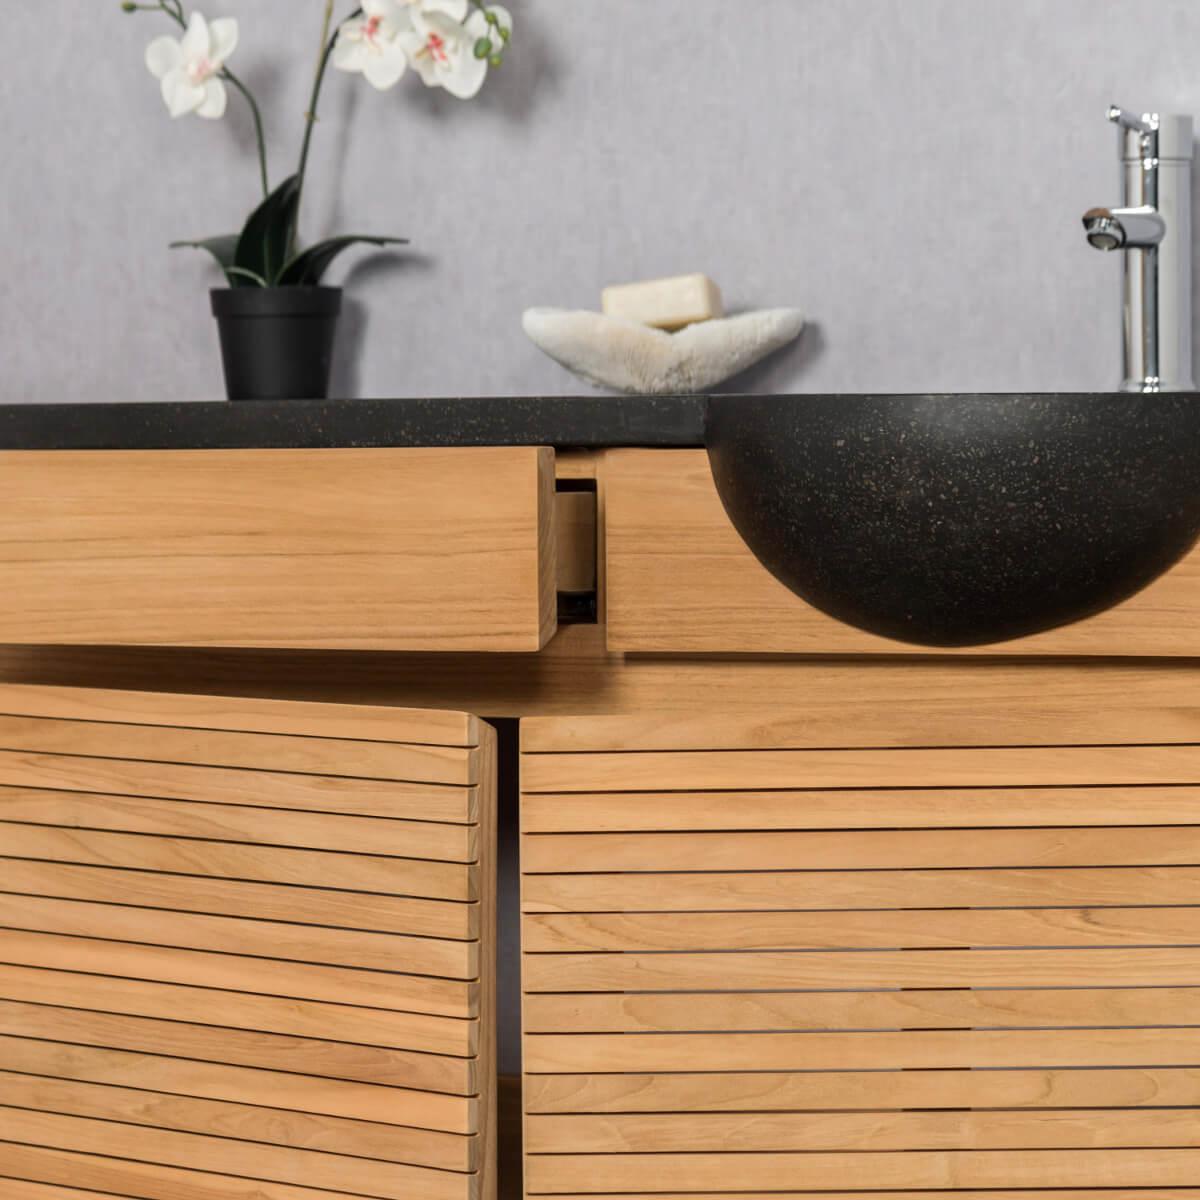 Meuble salle de bain meuble suspendu teck avec vasque - Meuble salle de bain vasque noire ...